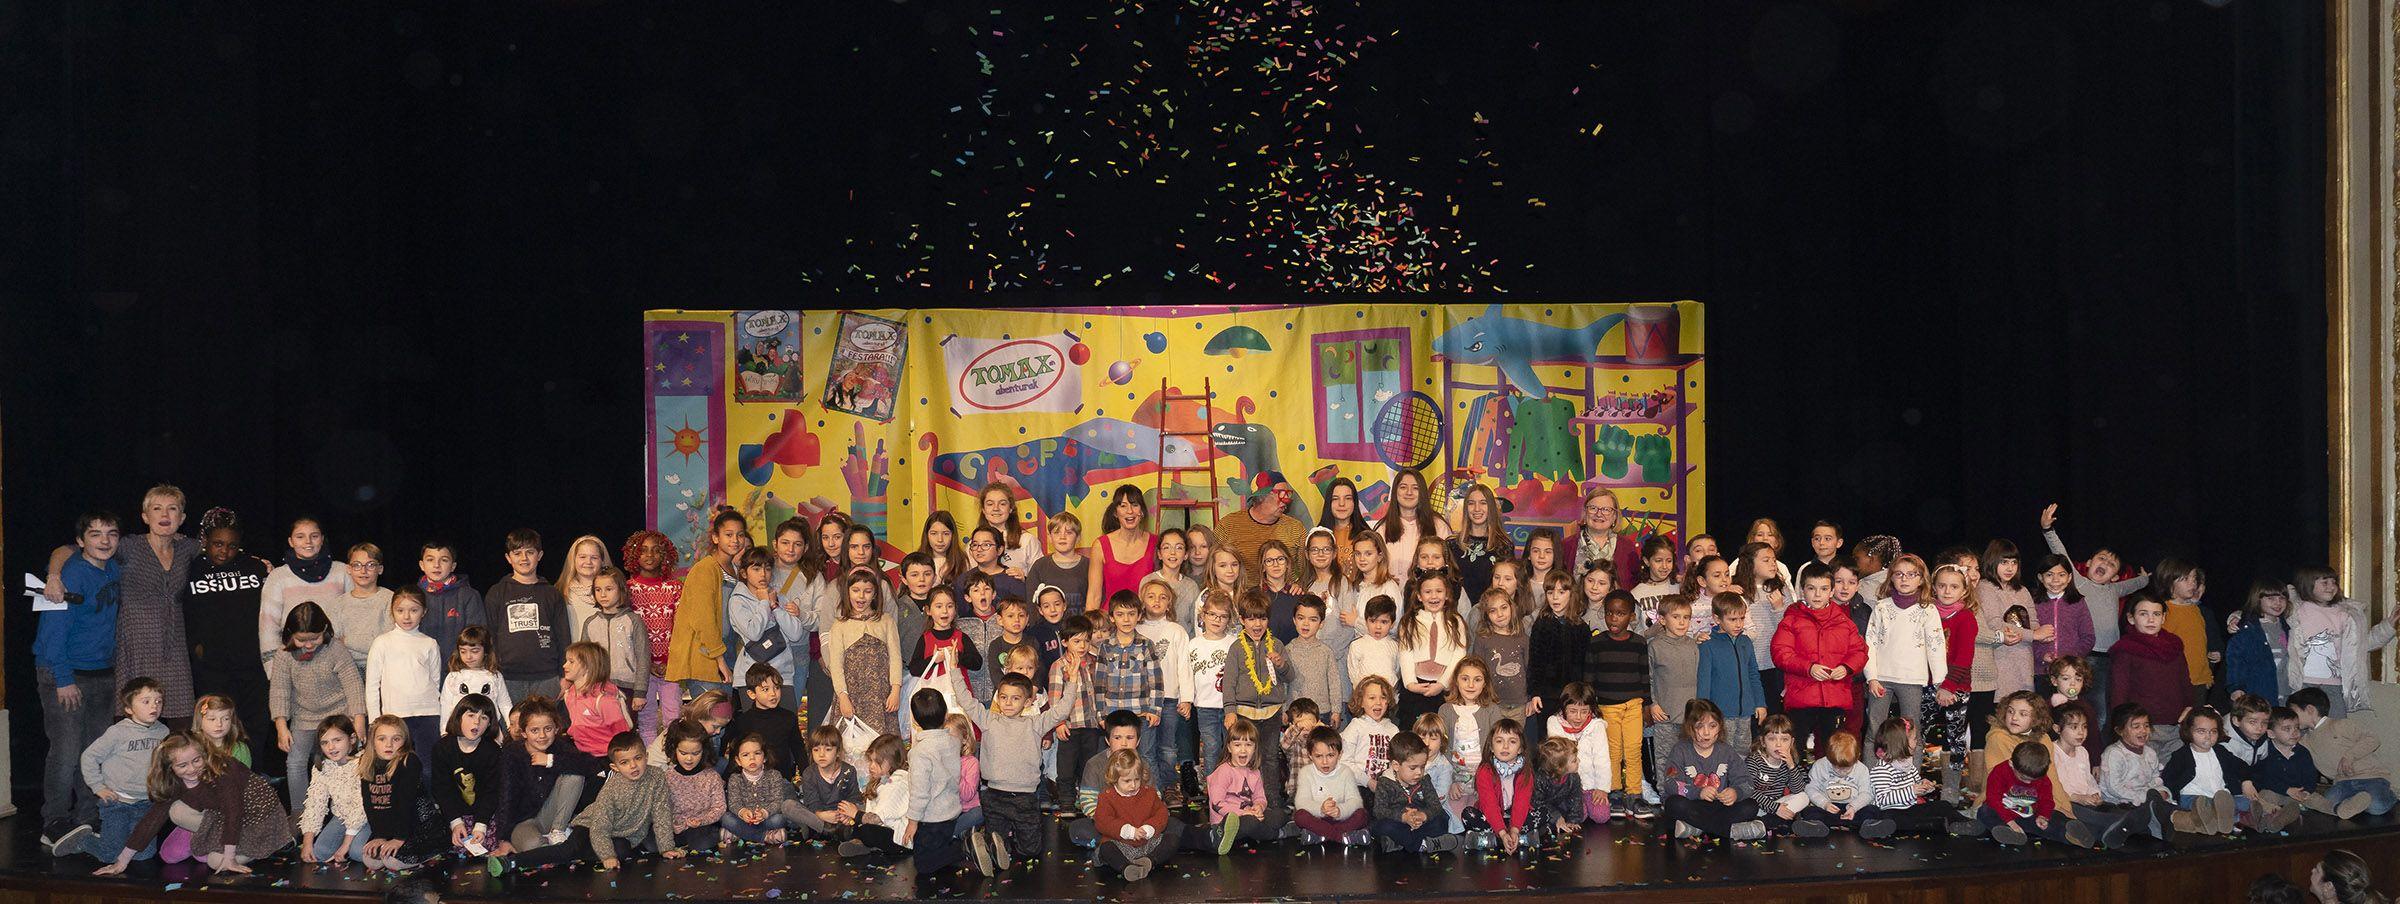 Fotografia Foto de familia en la fiesta infantil del COEGI celebrada